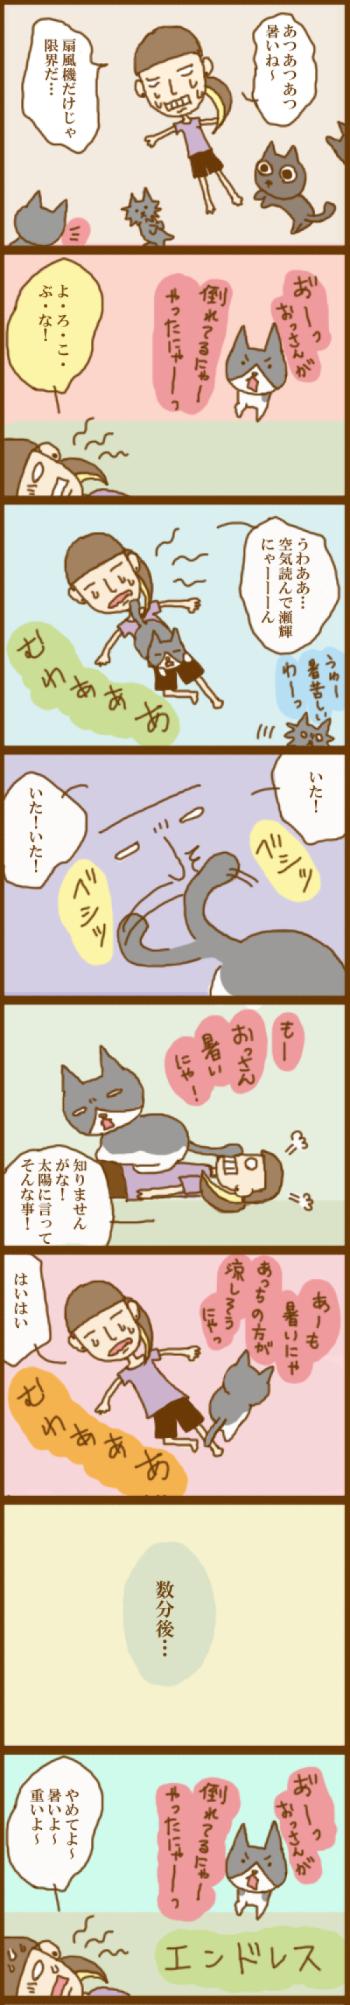 f:id:suzuokayu:20201119140543j:plain